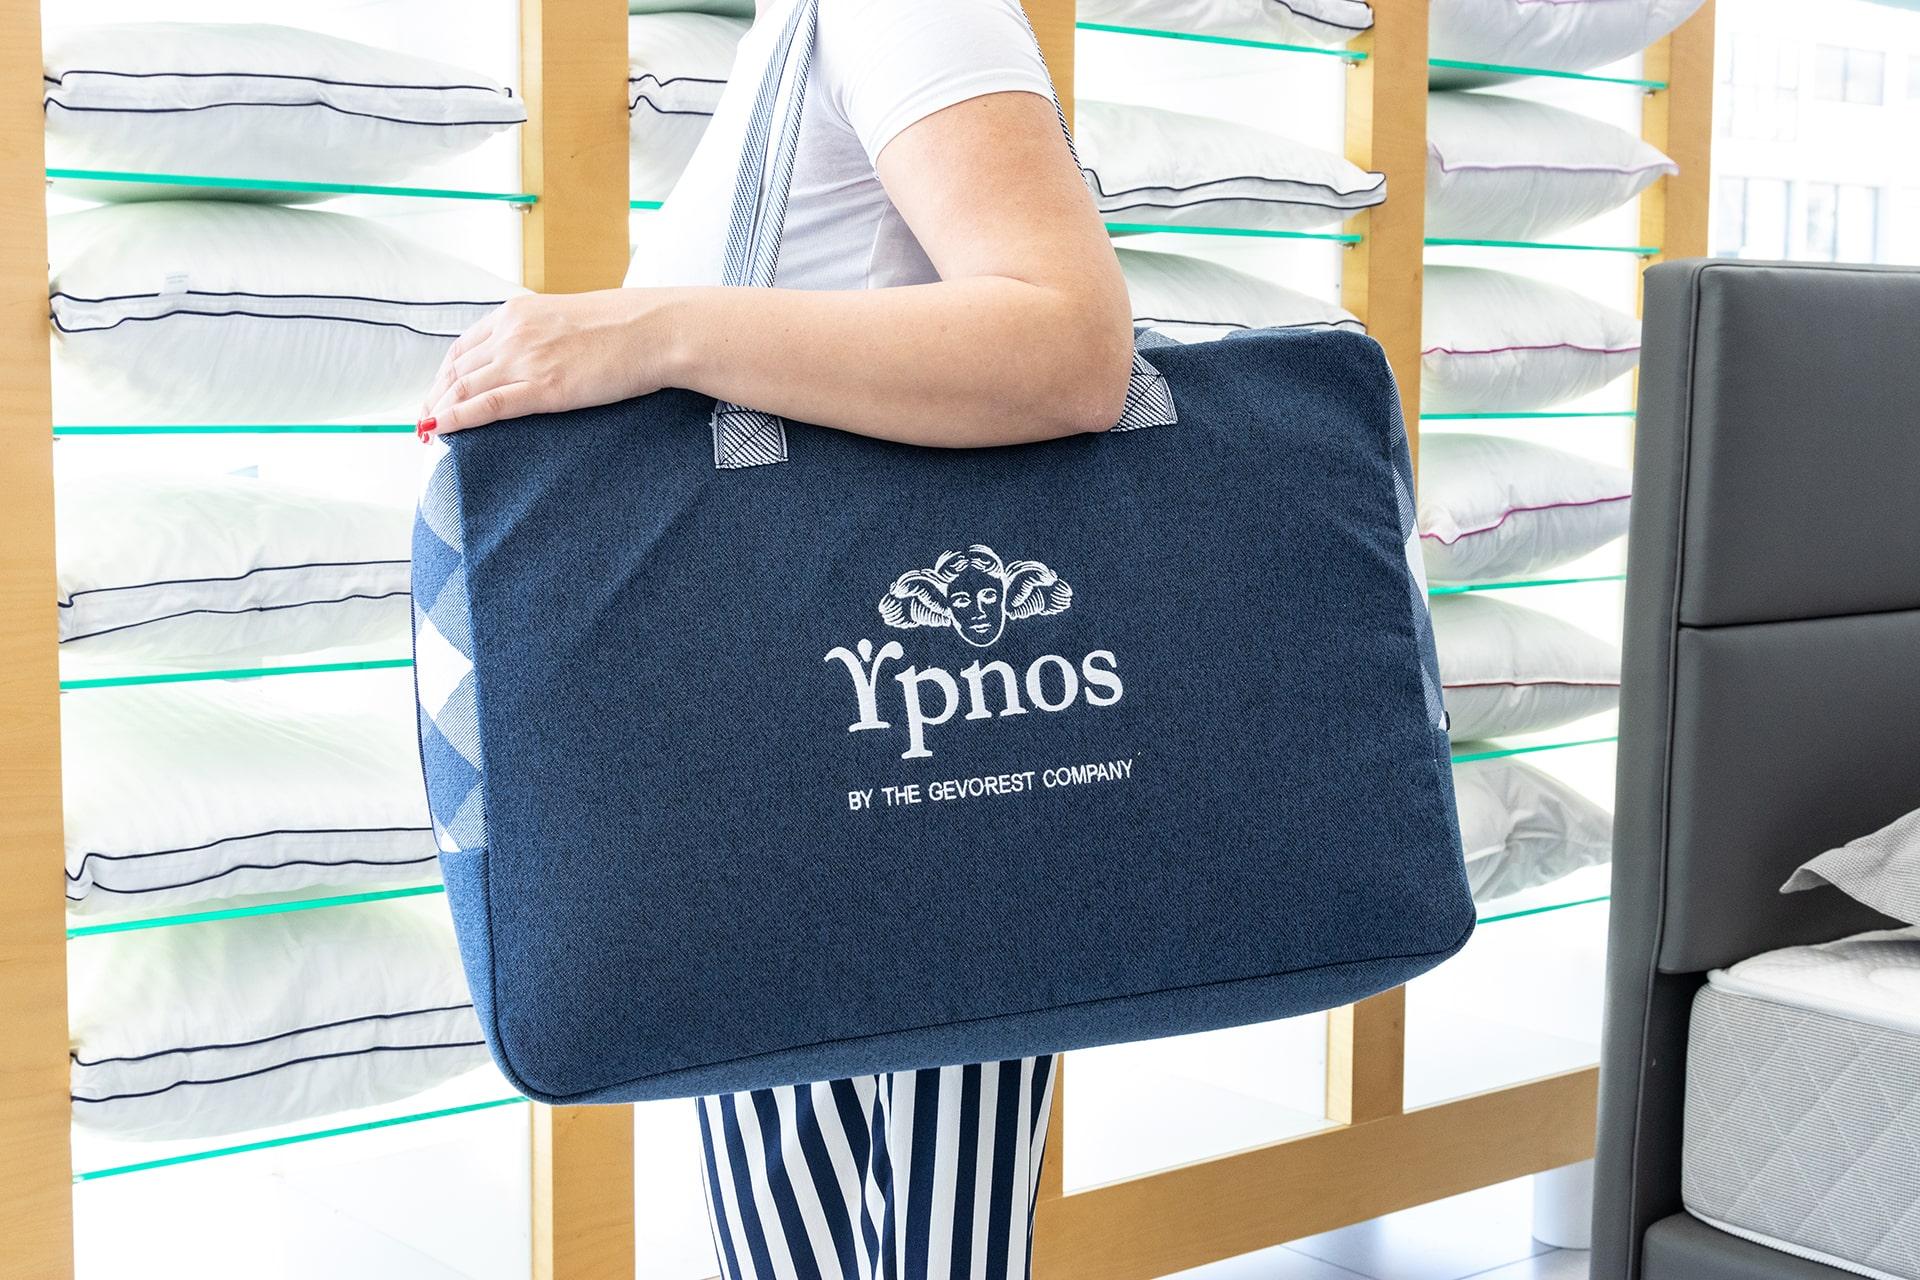 Ypnos pillow img 2